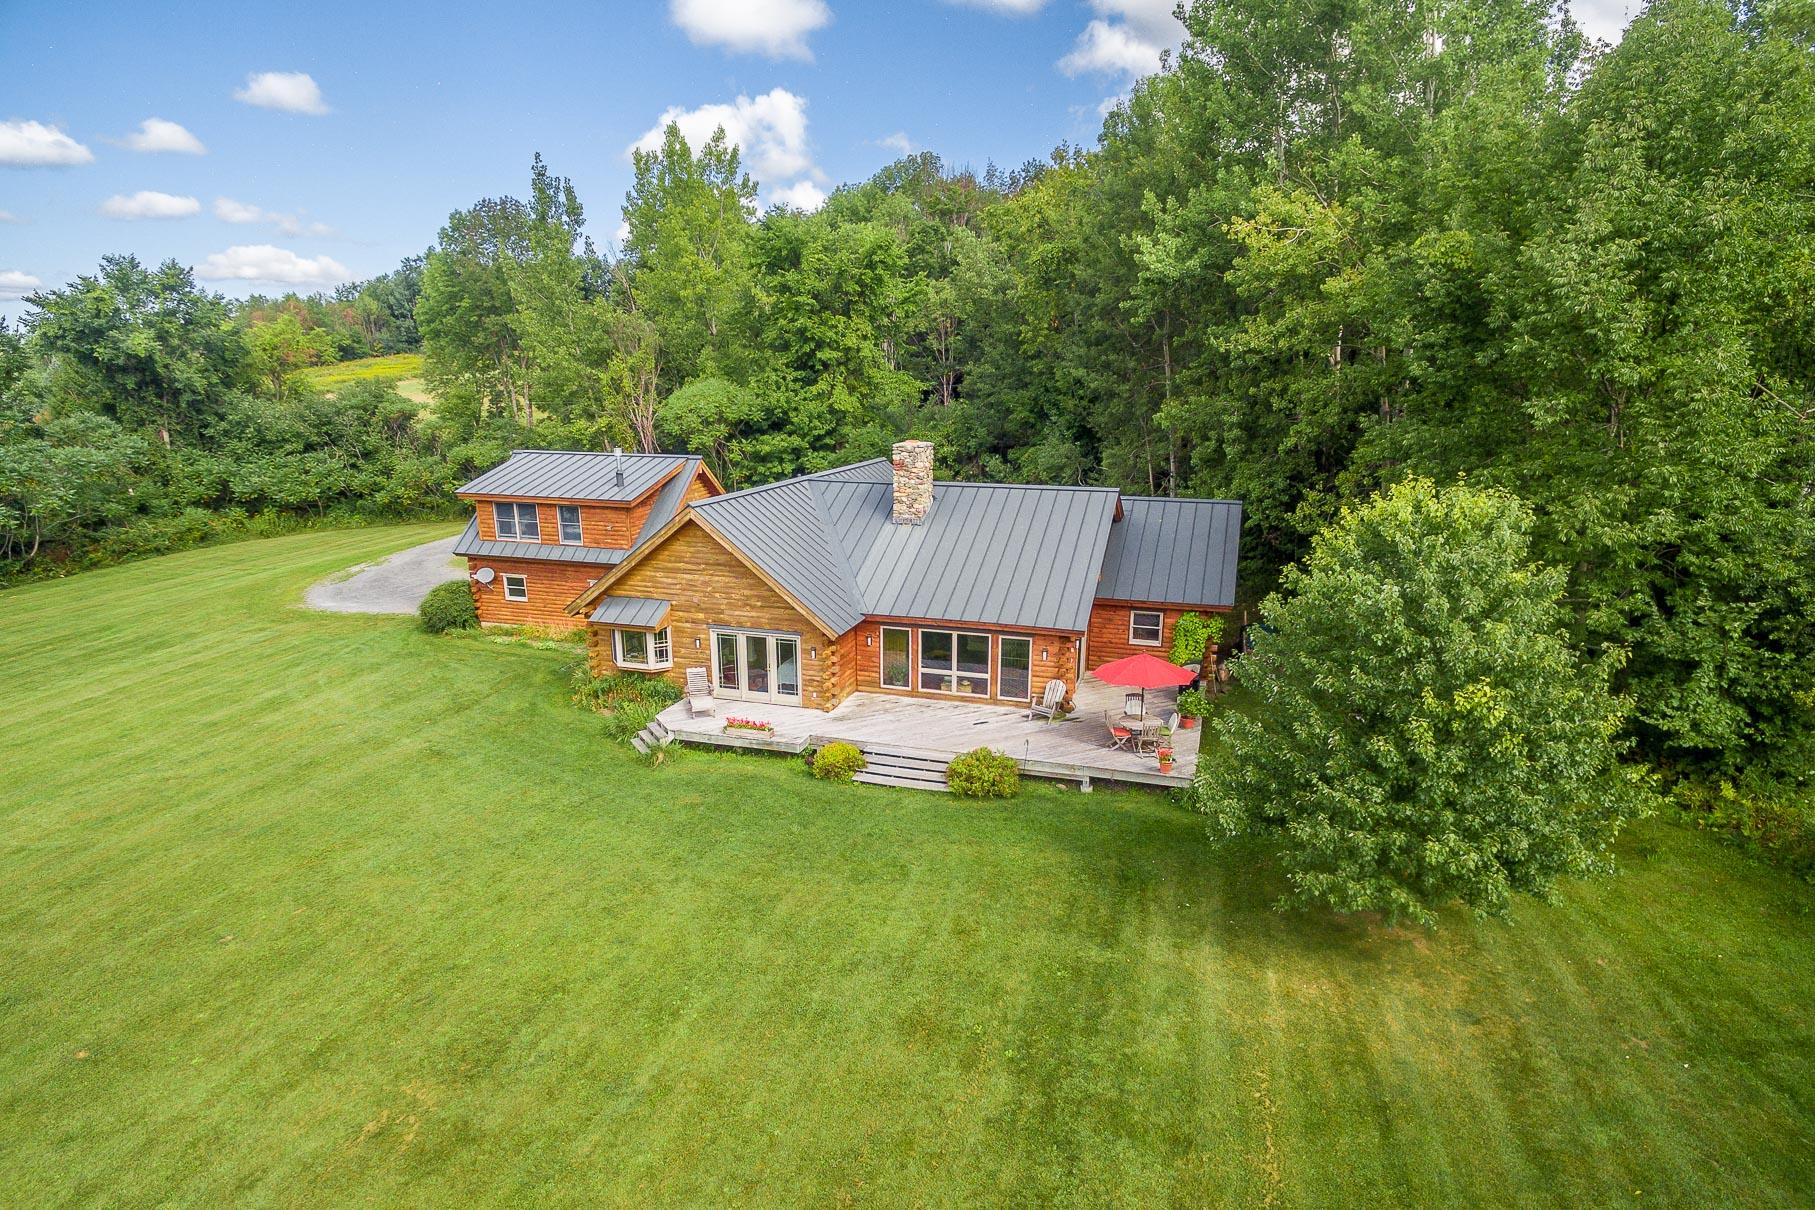 独户住宅 为 销售 在 Country Chic Log Home 55 Kelley Hill Rd 丹比, 05739 美国